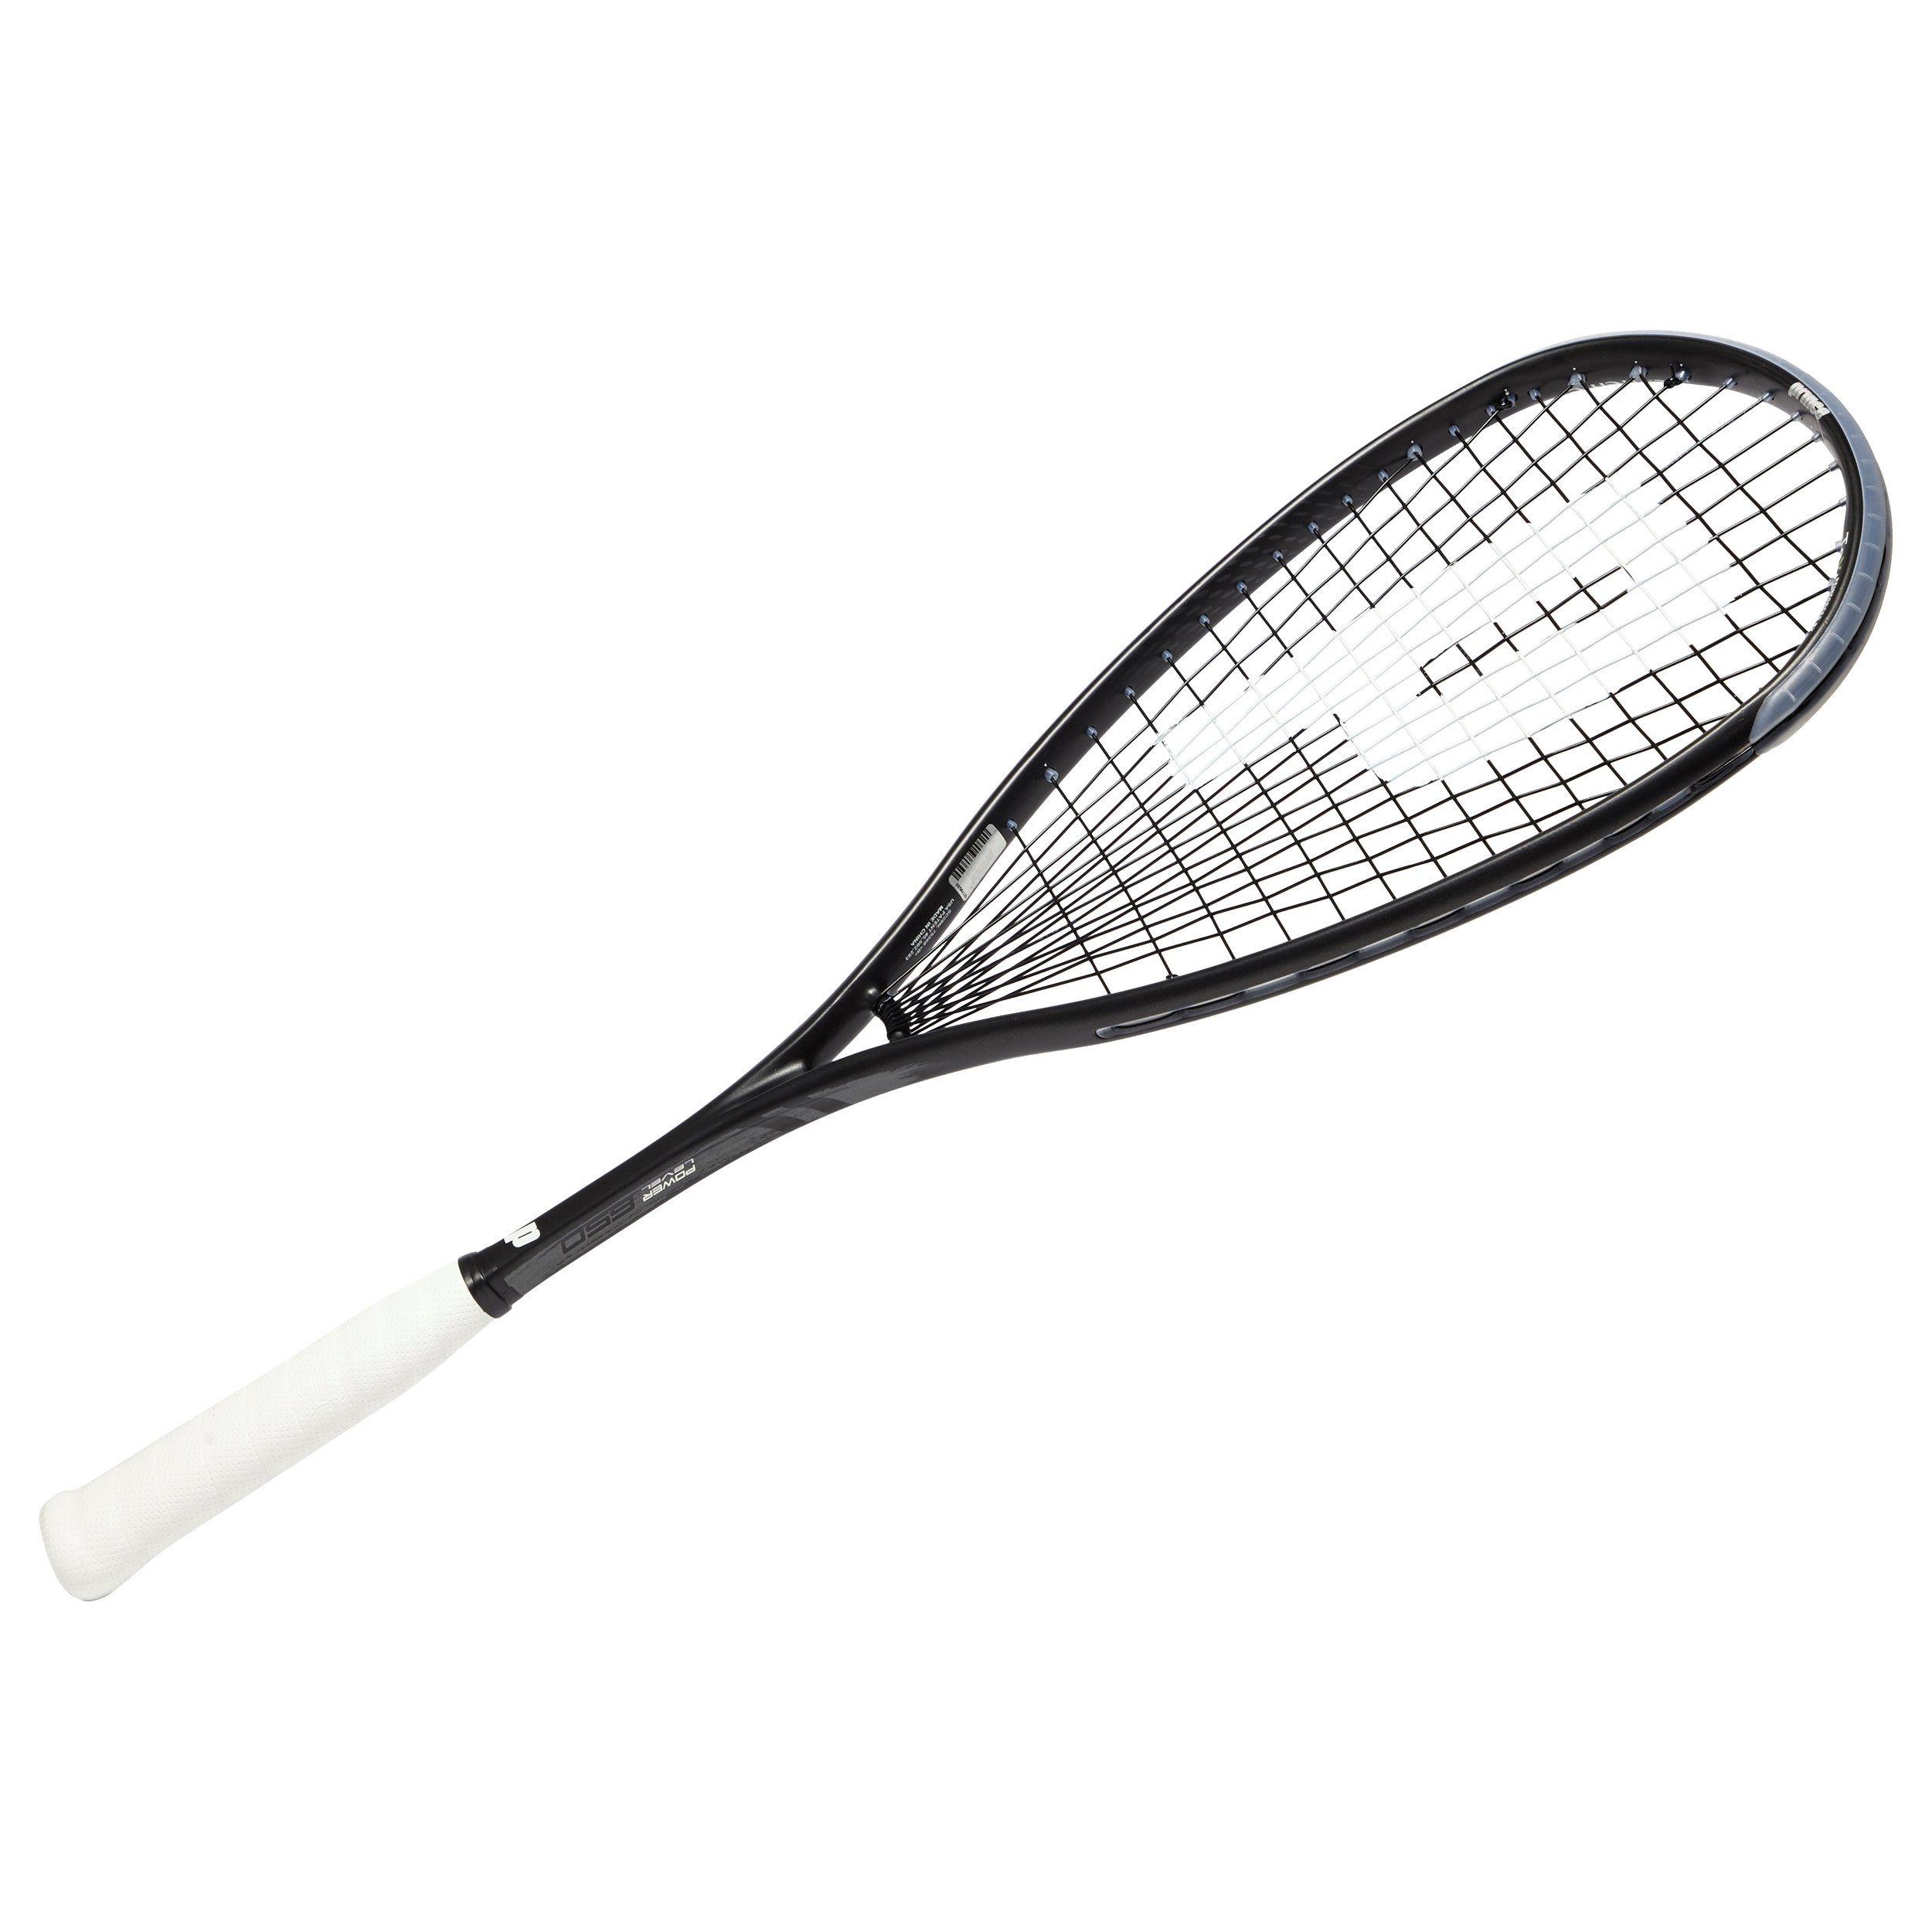 Prince Pro Warrior 650 Squash Racket